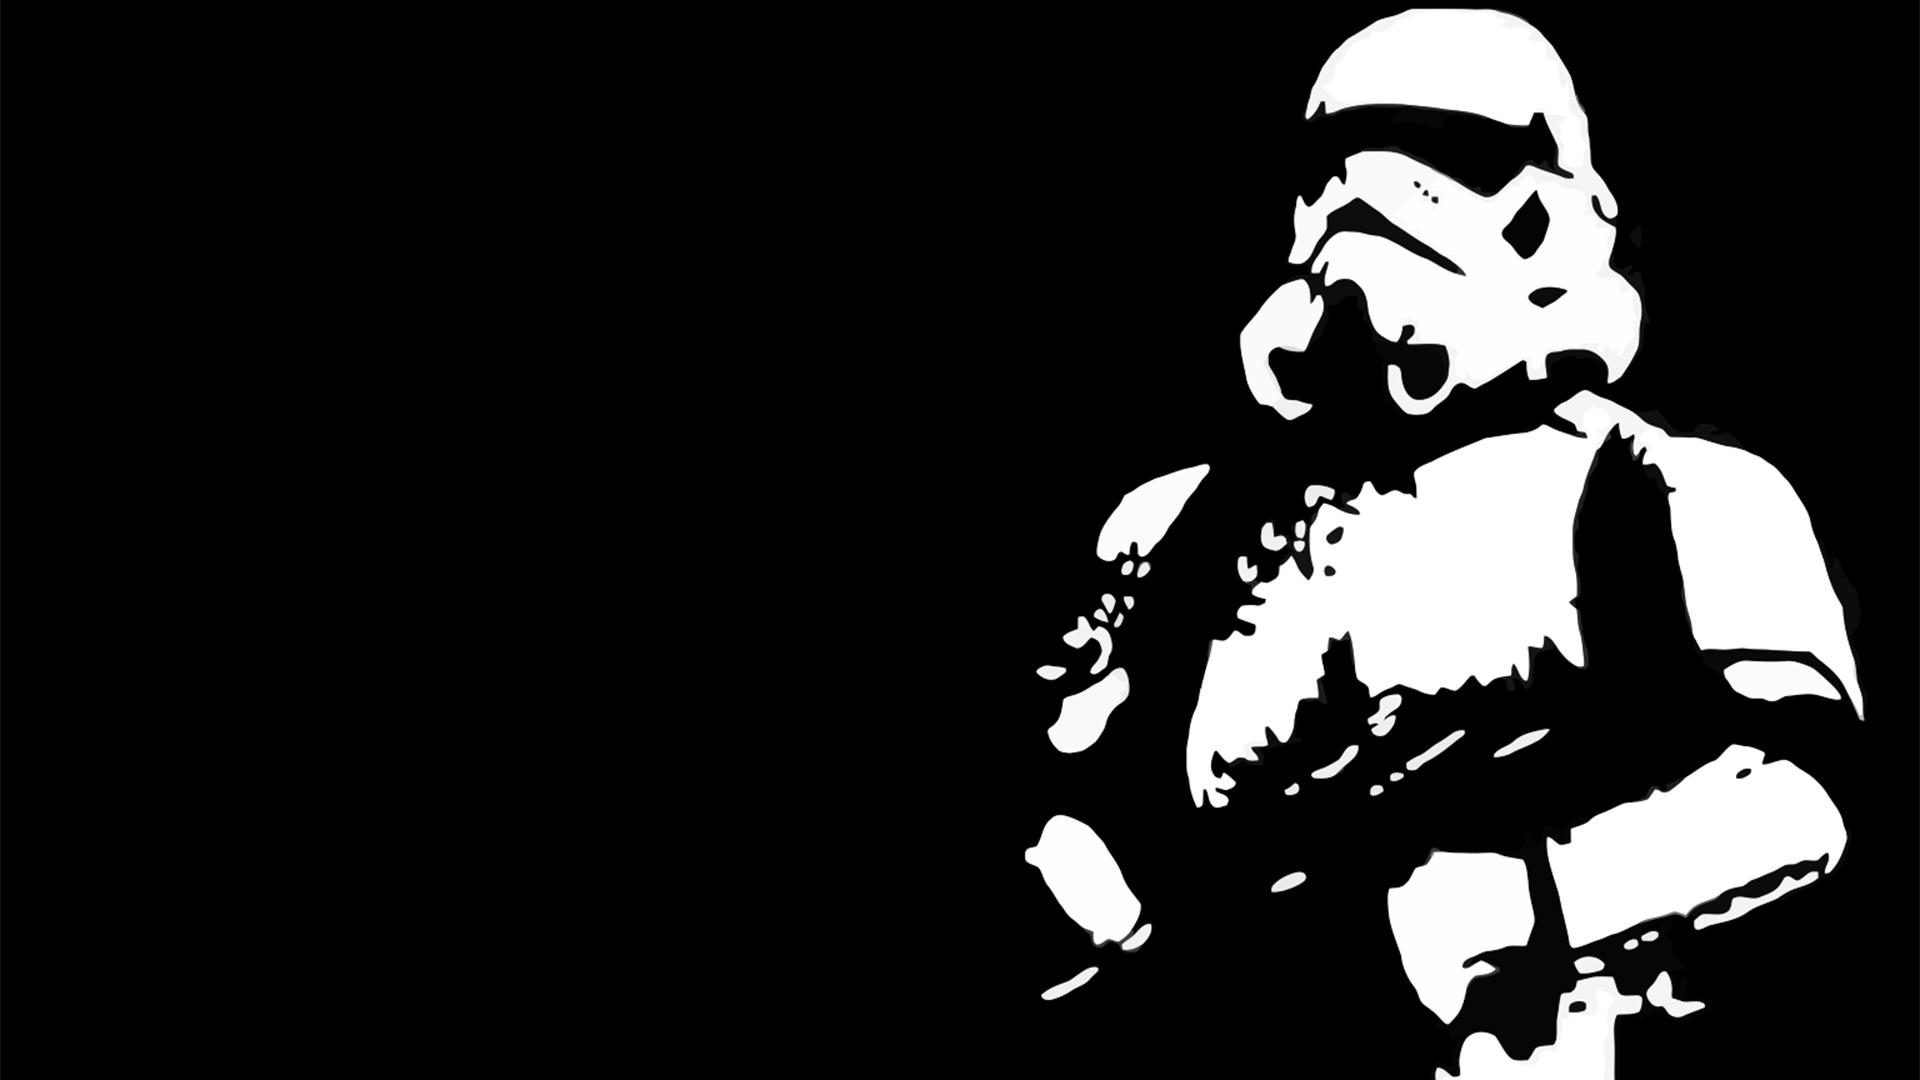 Star Wars Wallpaper 1920x1080 Star Wars Stormtroopers Contrast 1920x1080